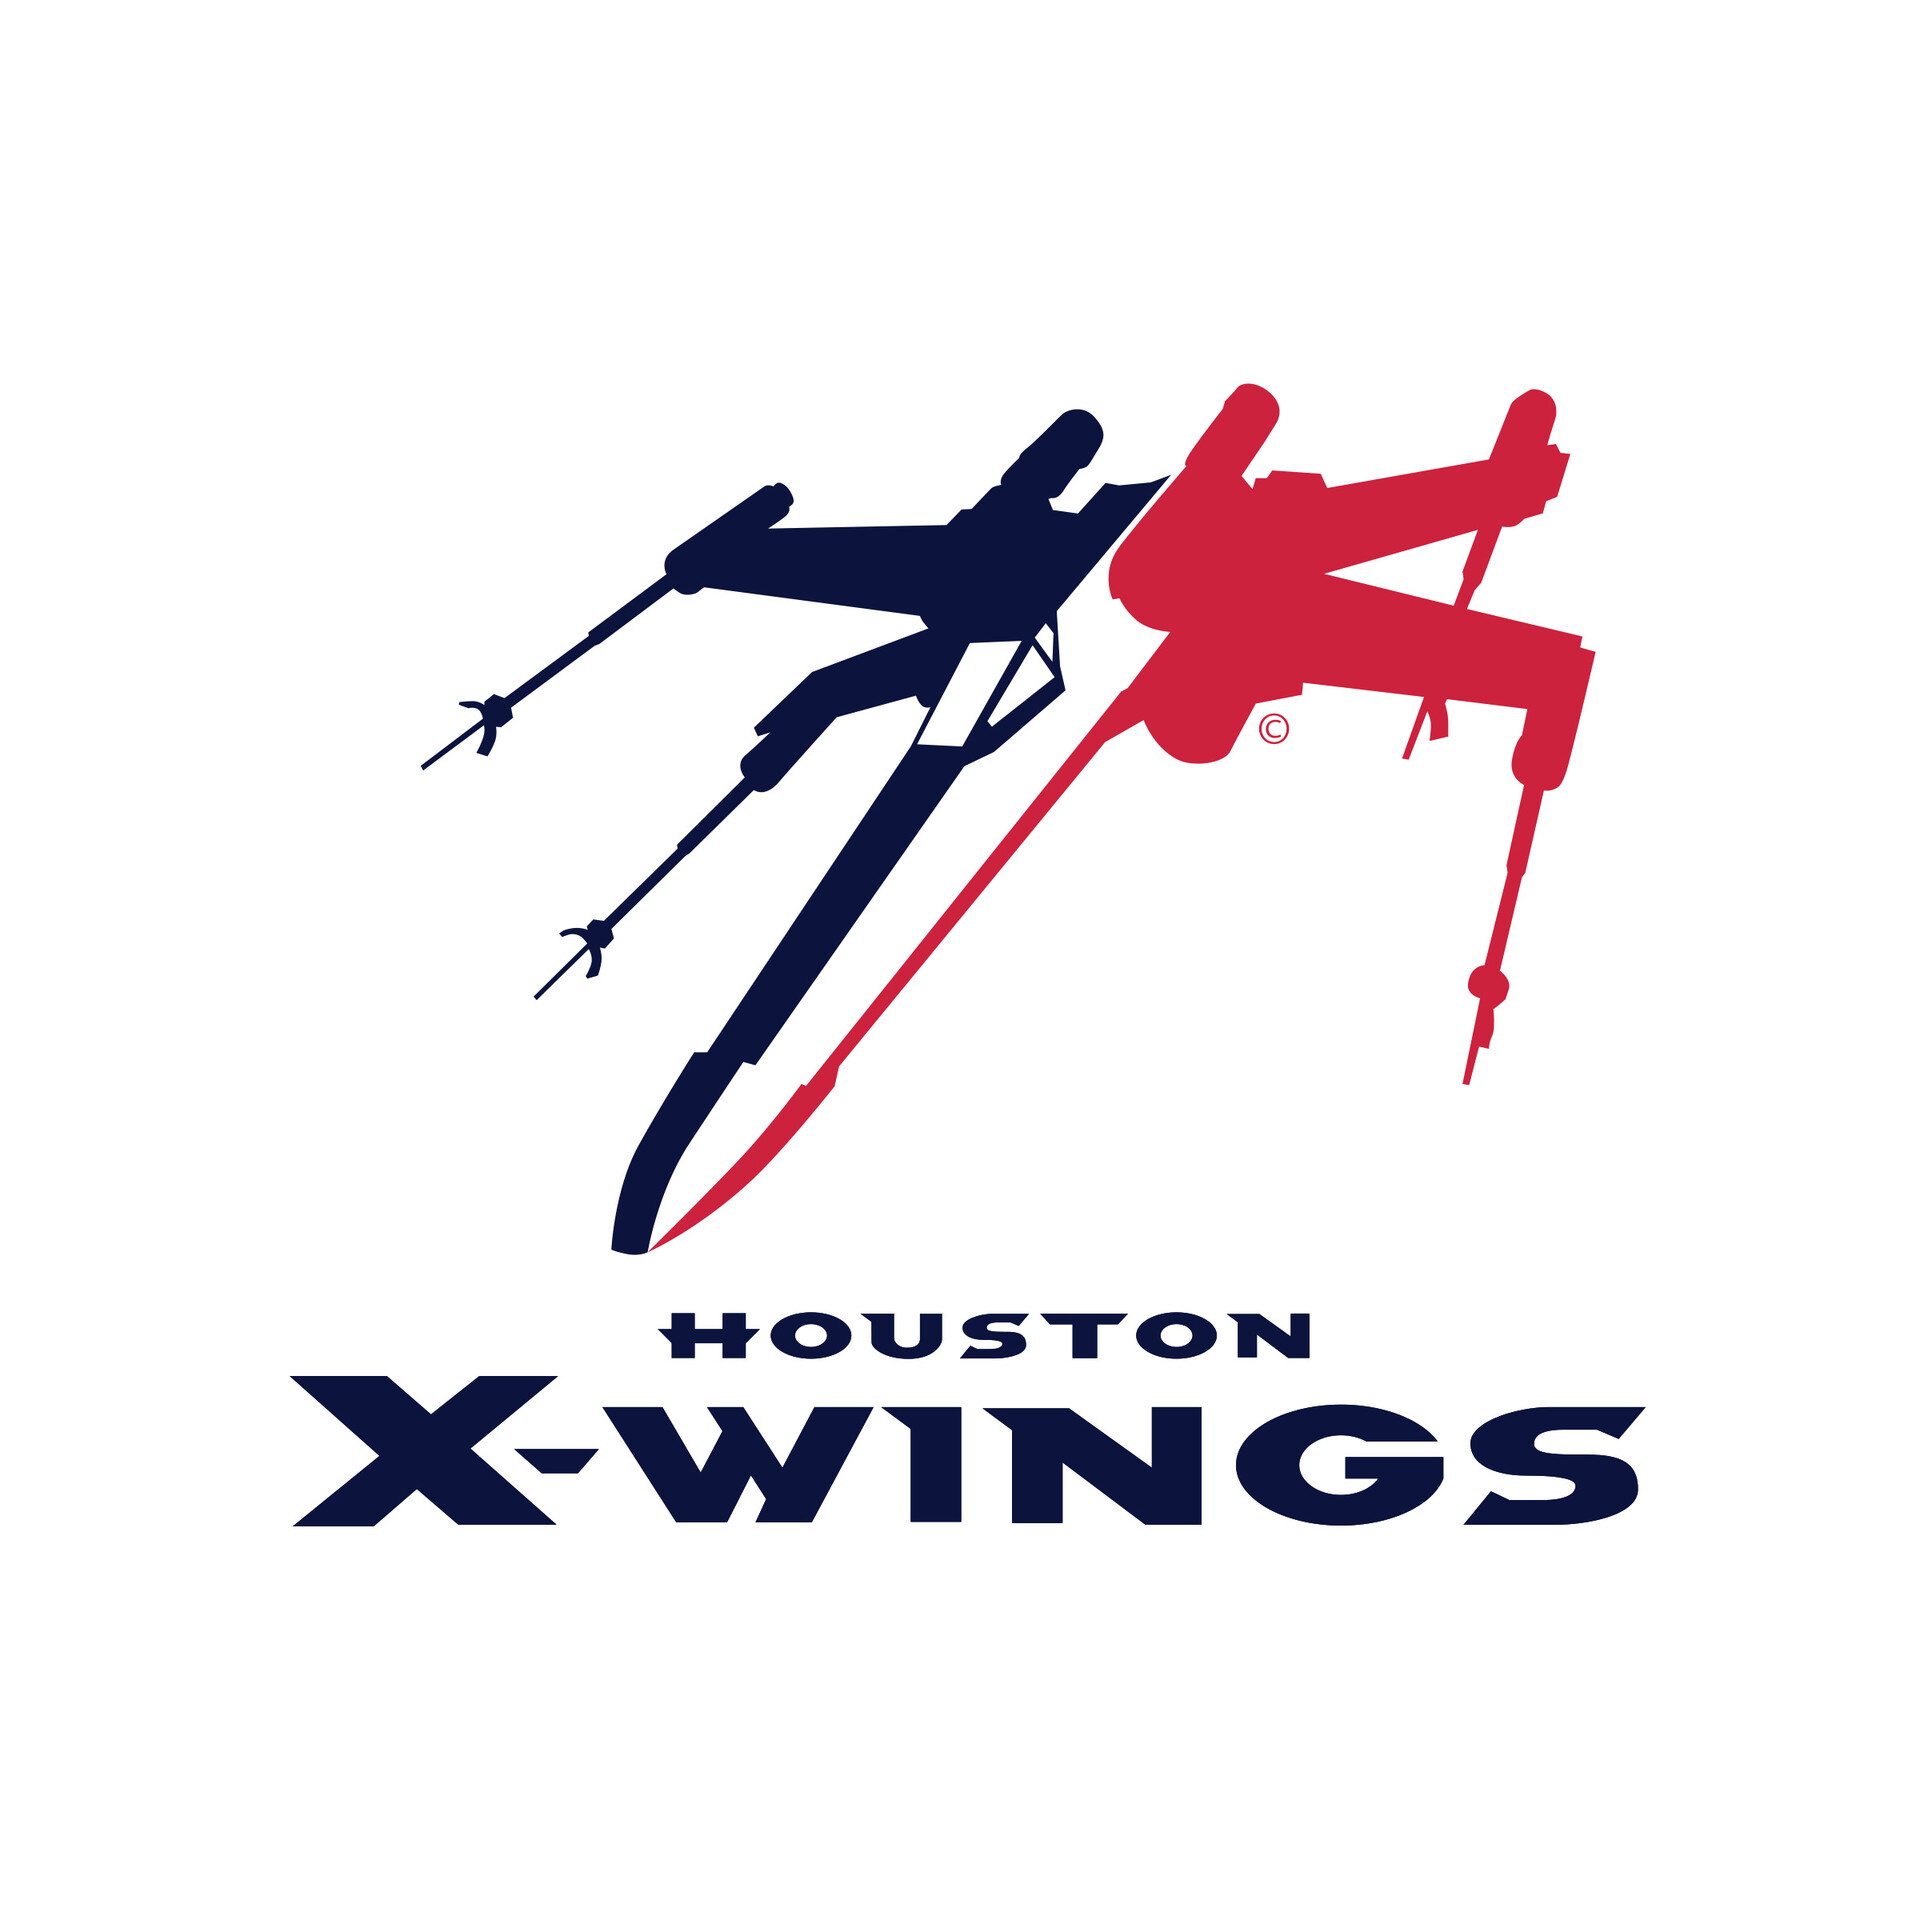 Houston X-wings